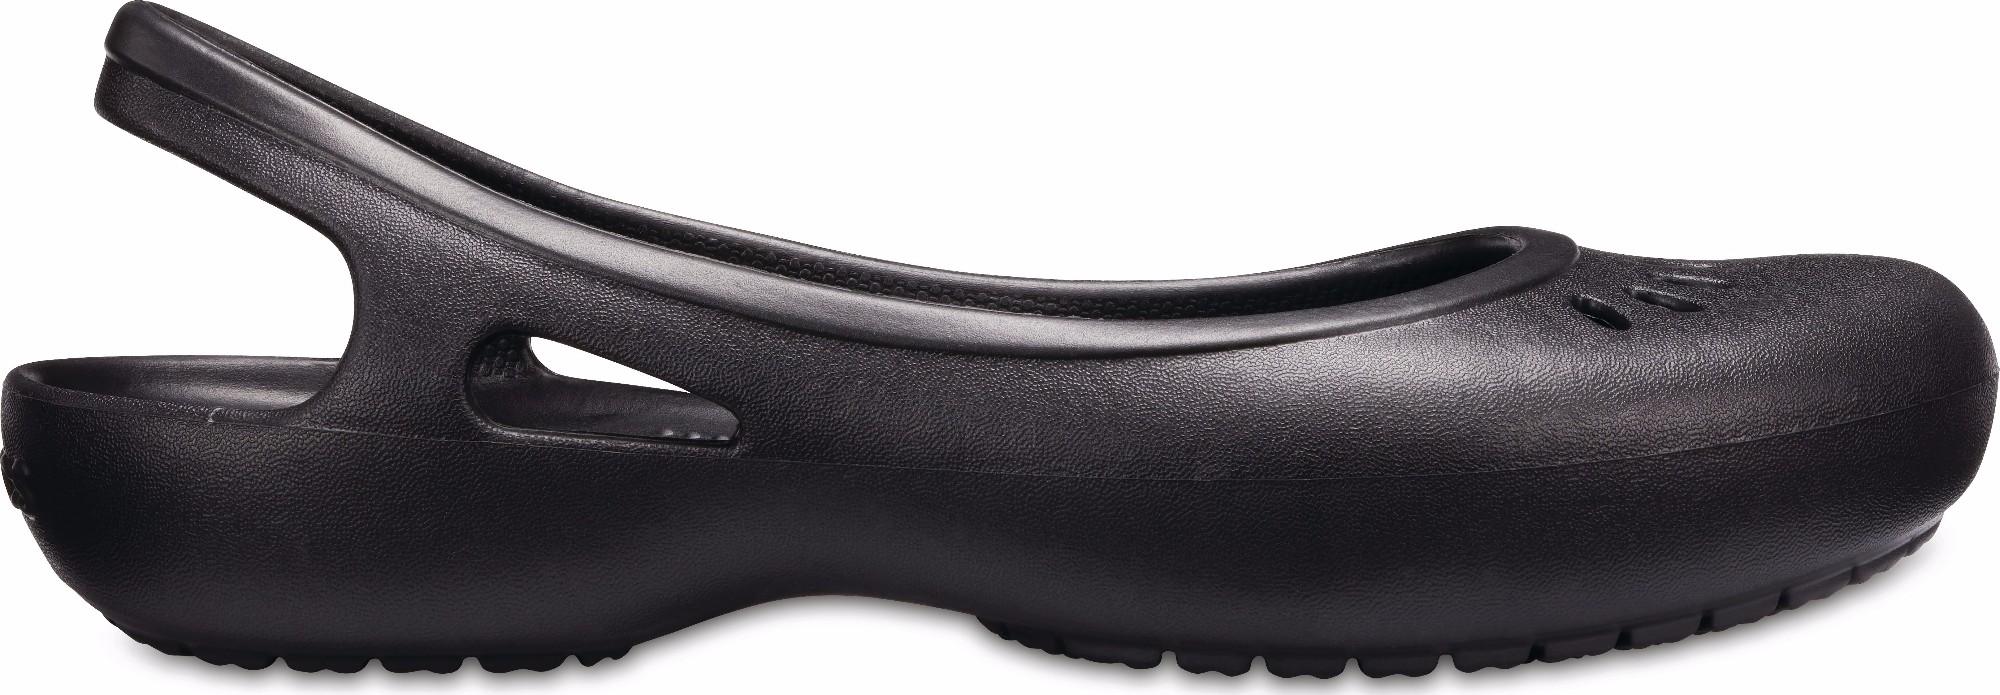 Crocs™ Kadee Slingback Black 37,5